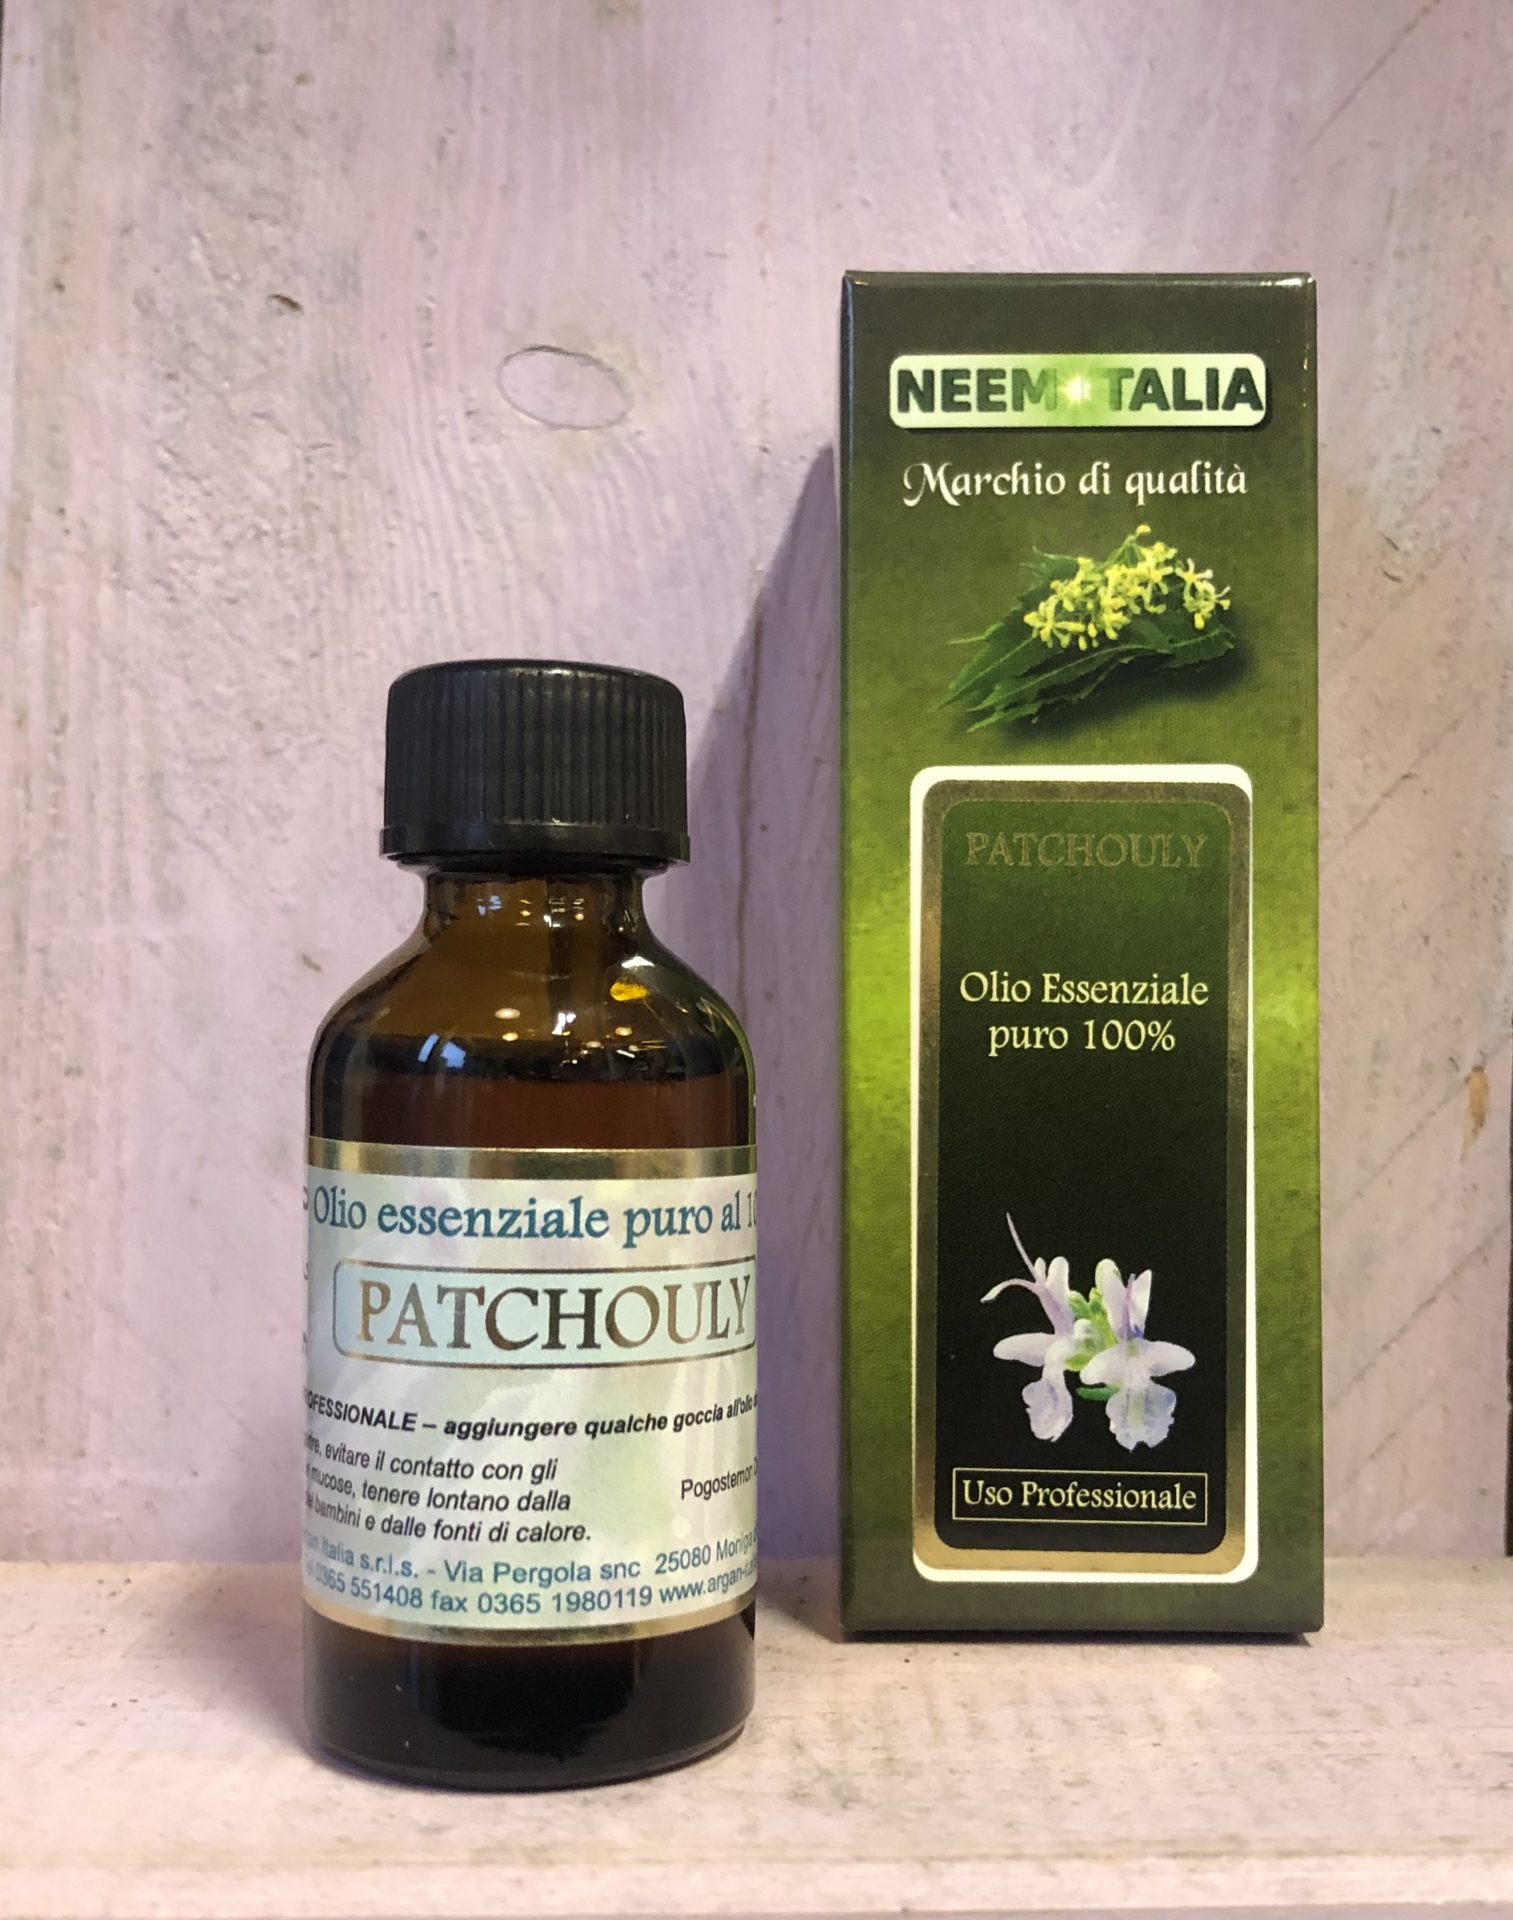 Olio essenziale di Patchouly